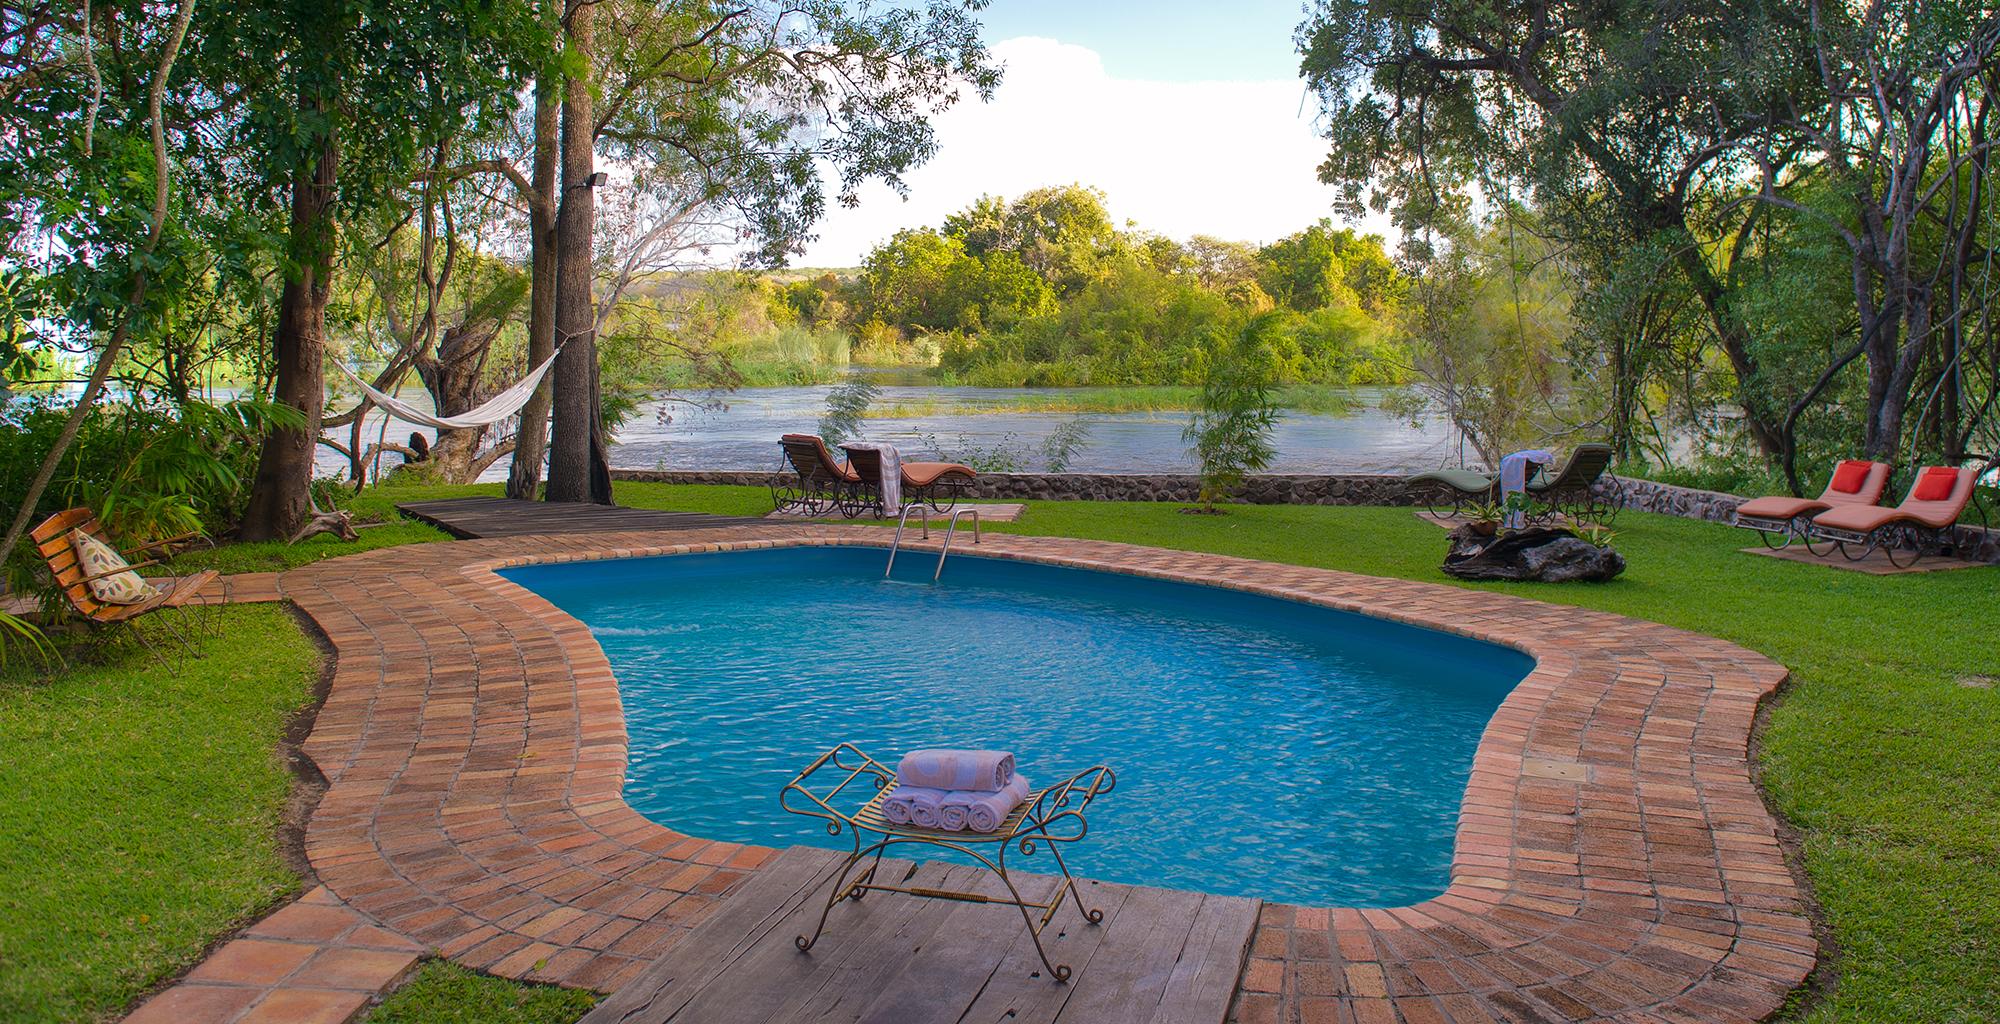 Zambia-Islands-of-Siankaba-Pool